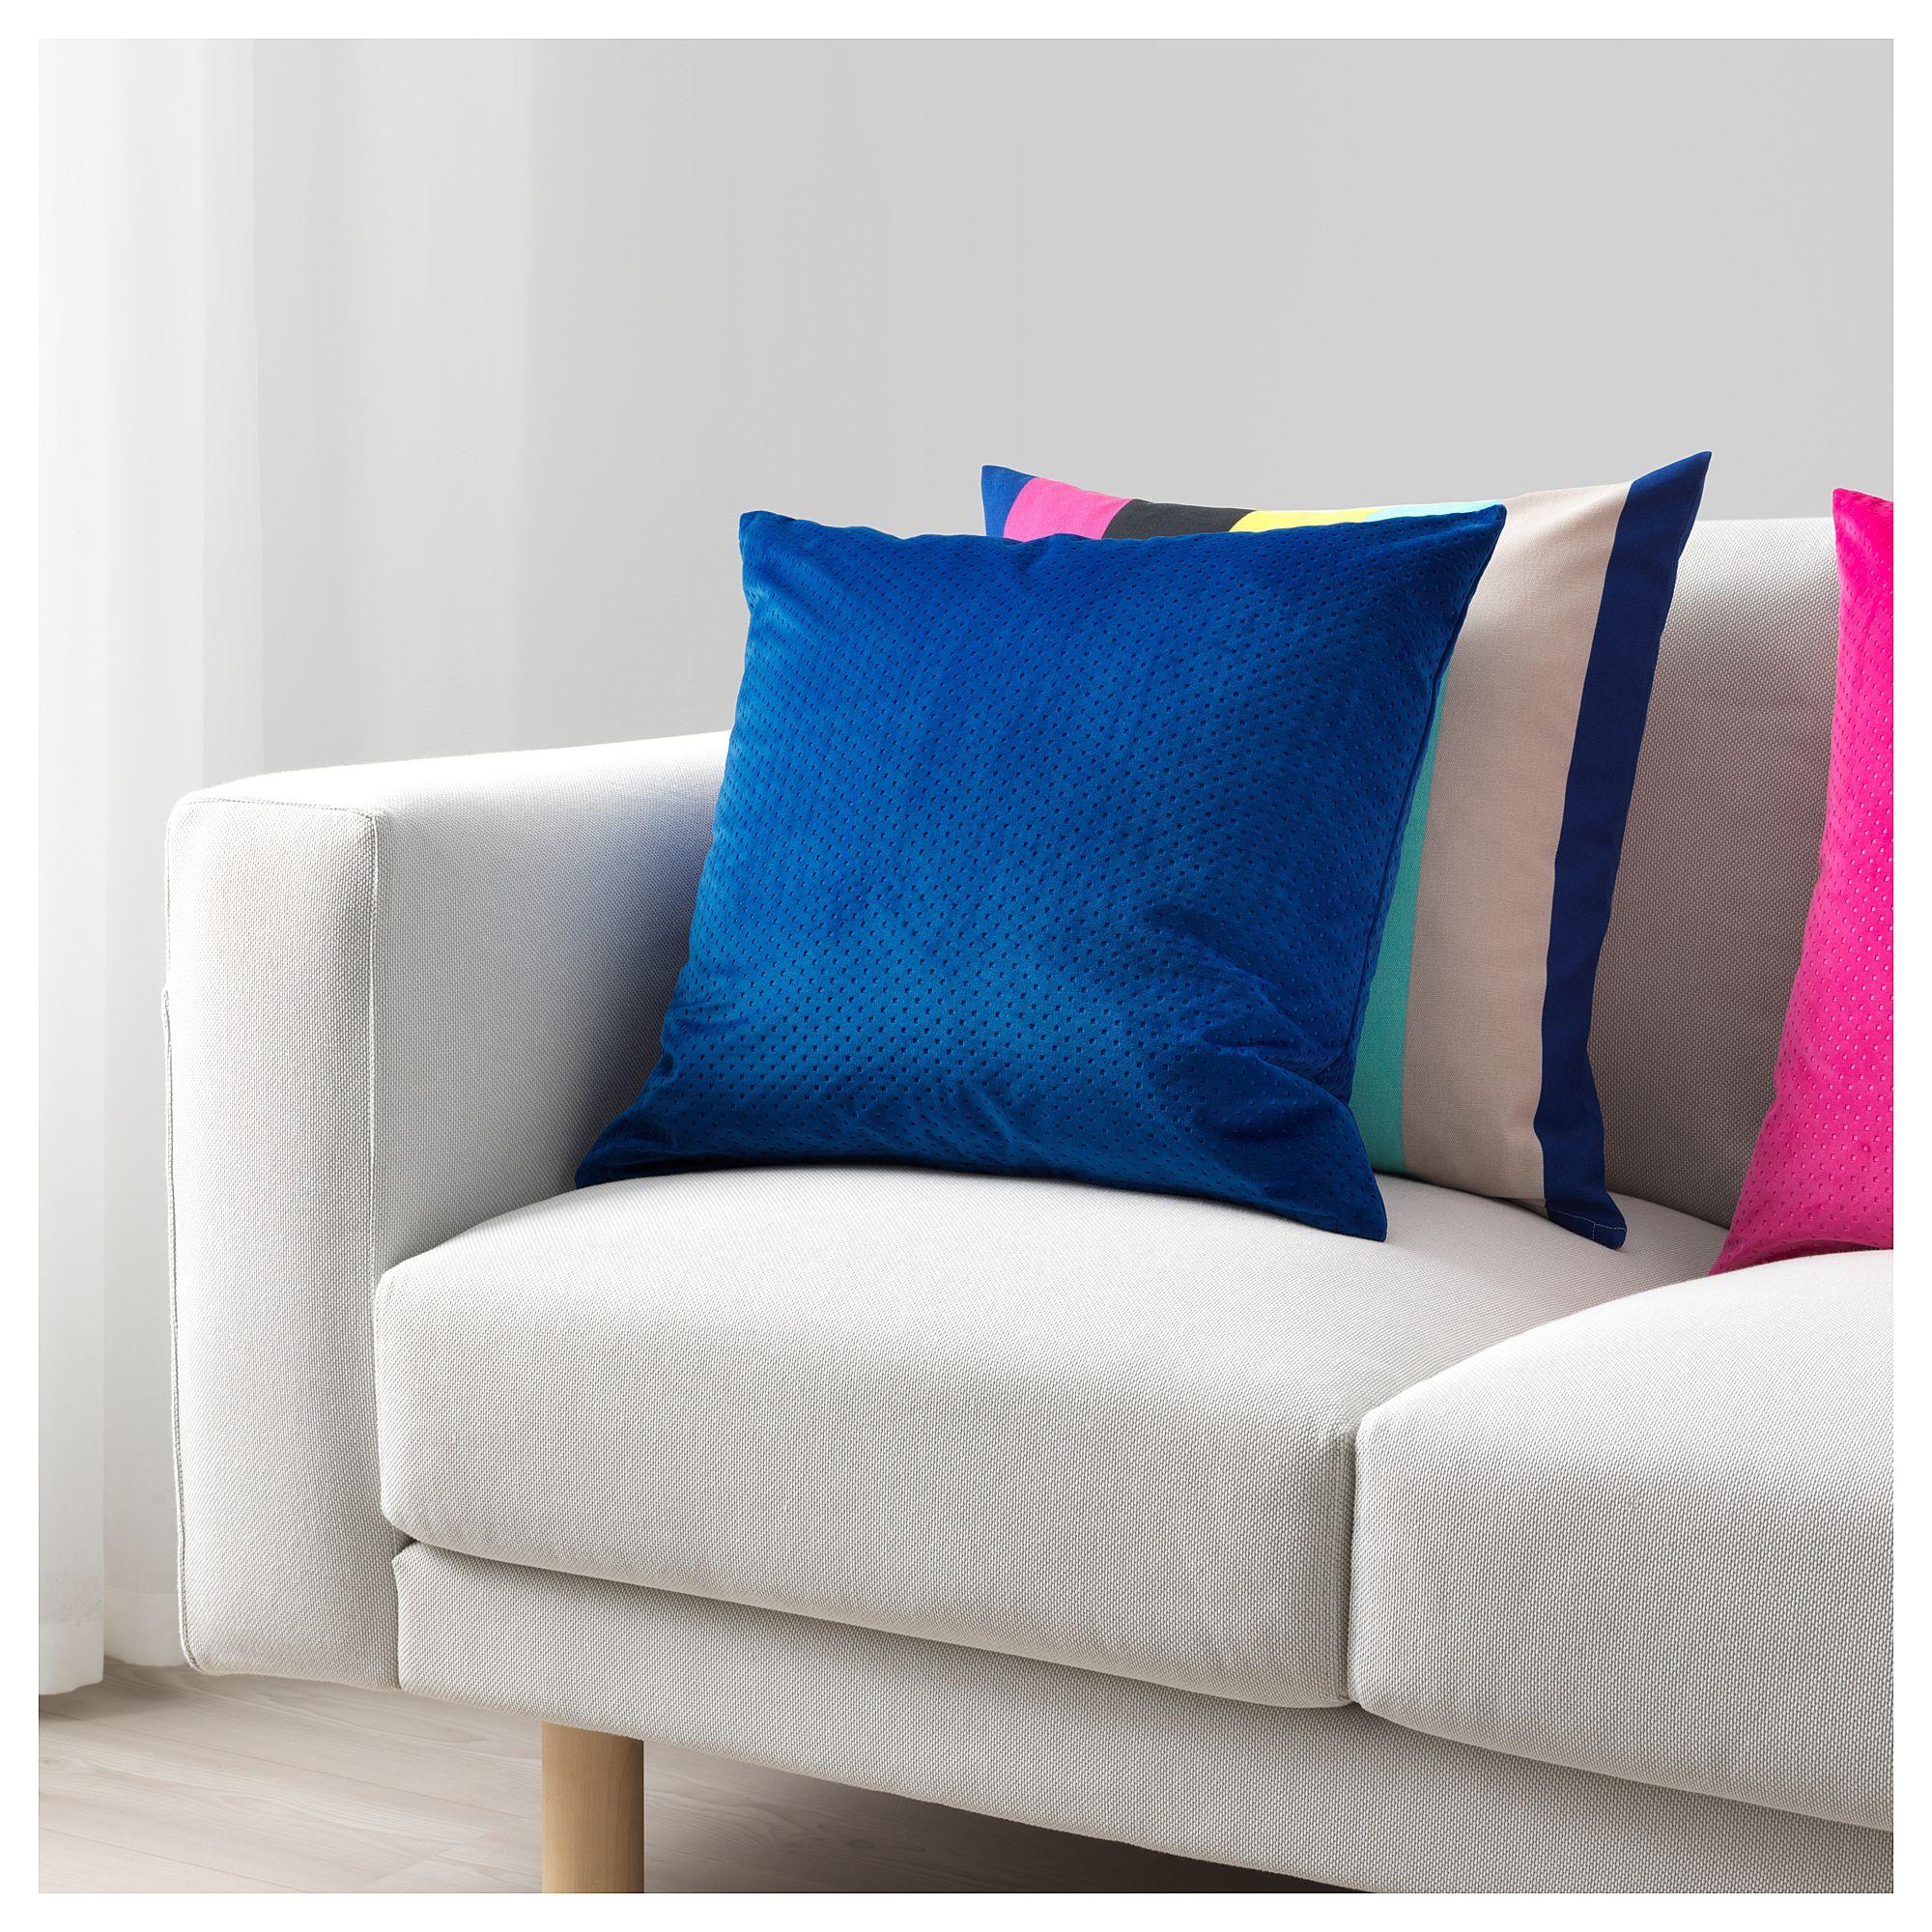 "VENCHE Cushion cover blue 20x20 "" (50x50 cm) Bed"